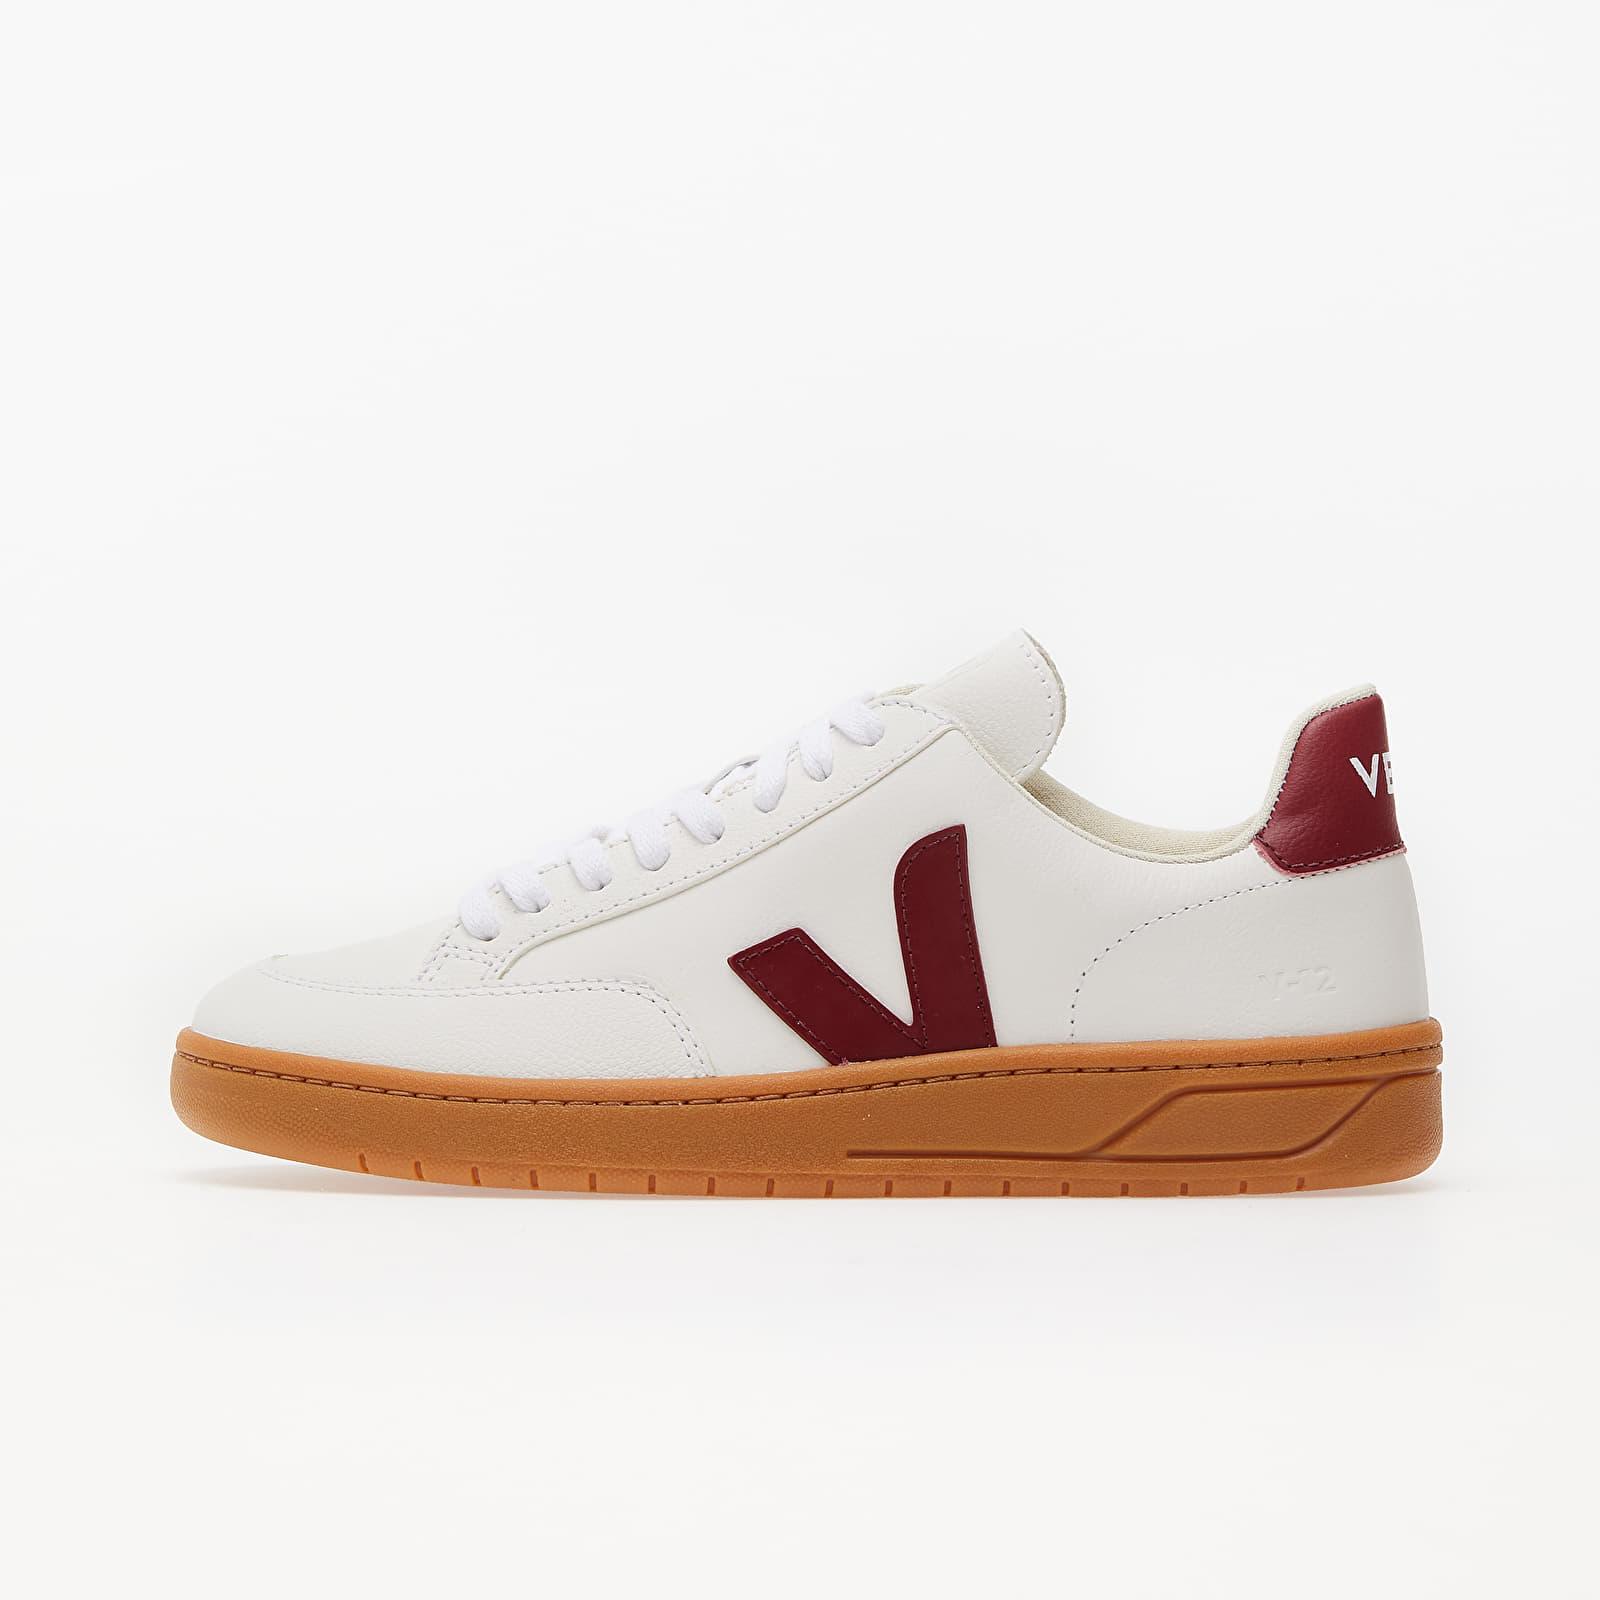 Repelente fibra Engañoso  Women's shoes Veja V-12 Open White | Footshop